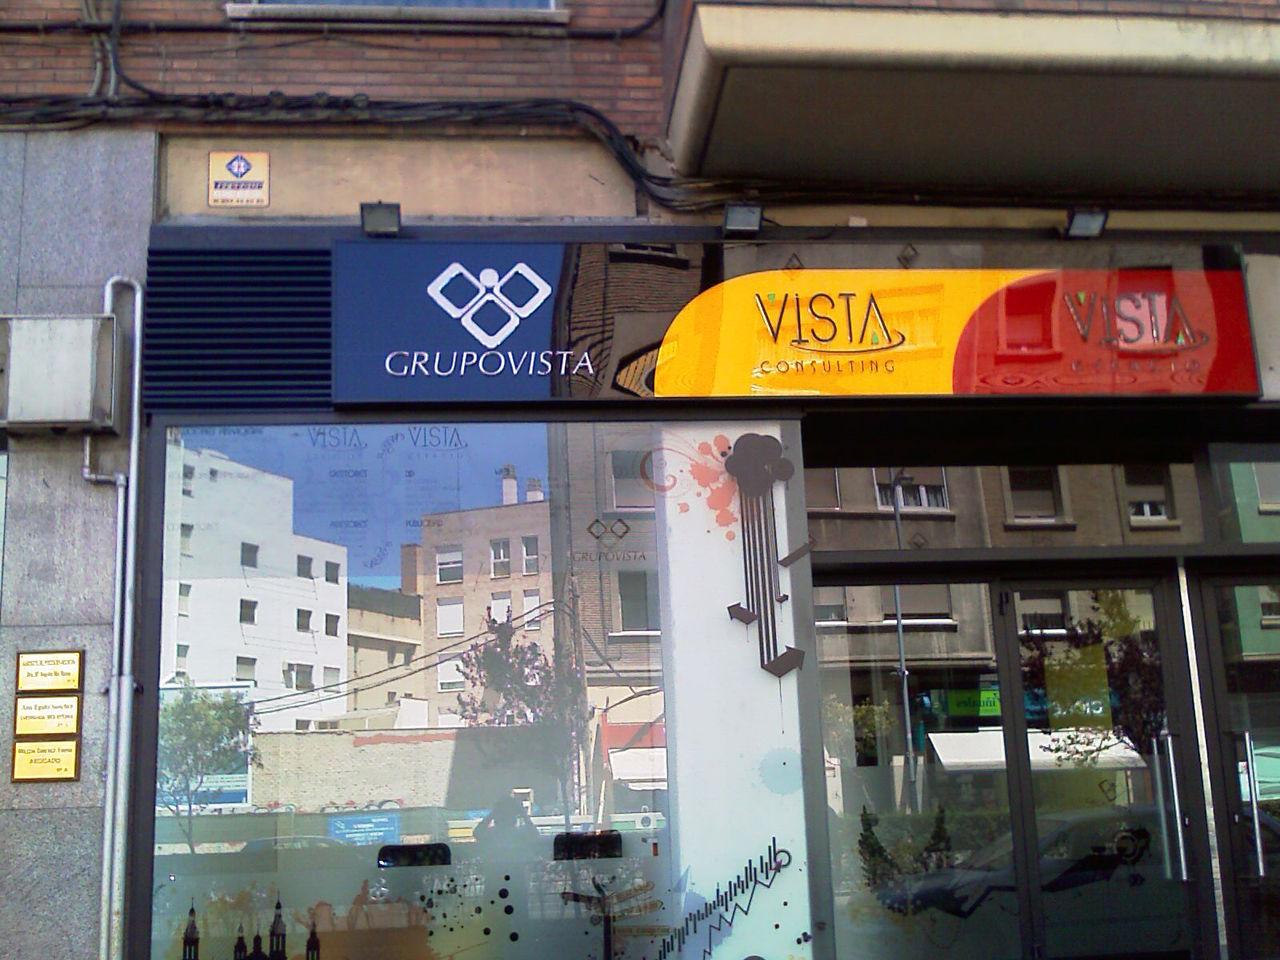 Rotulos luminosos zaragoza rotulos zaragoza rotulos fachadas comerciales letras - Vinilo huesca ...